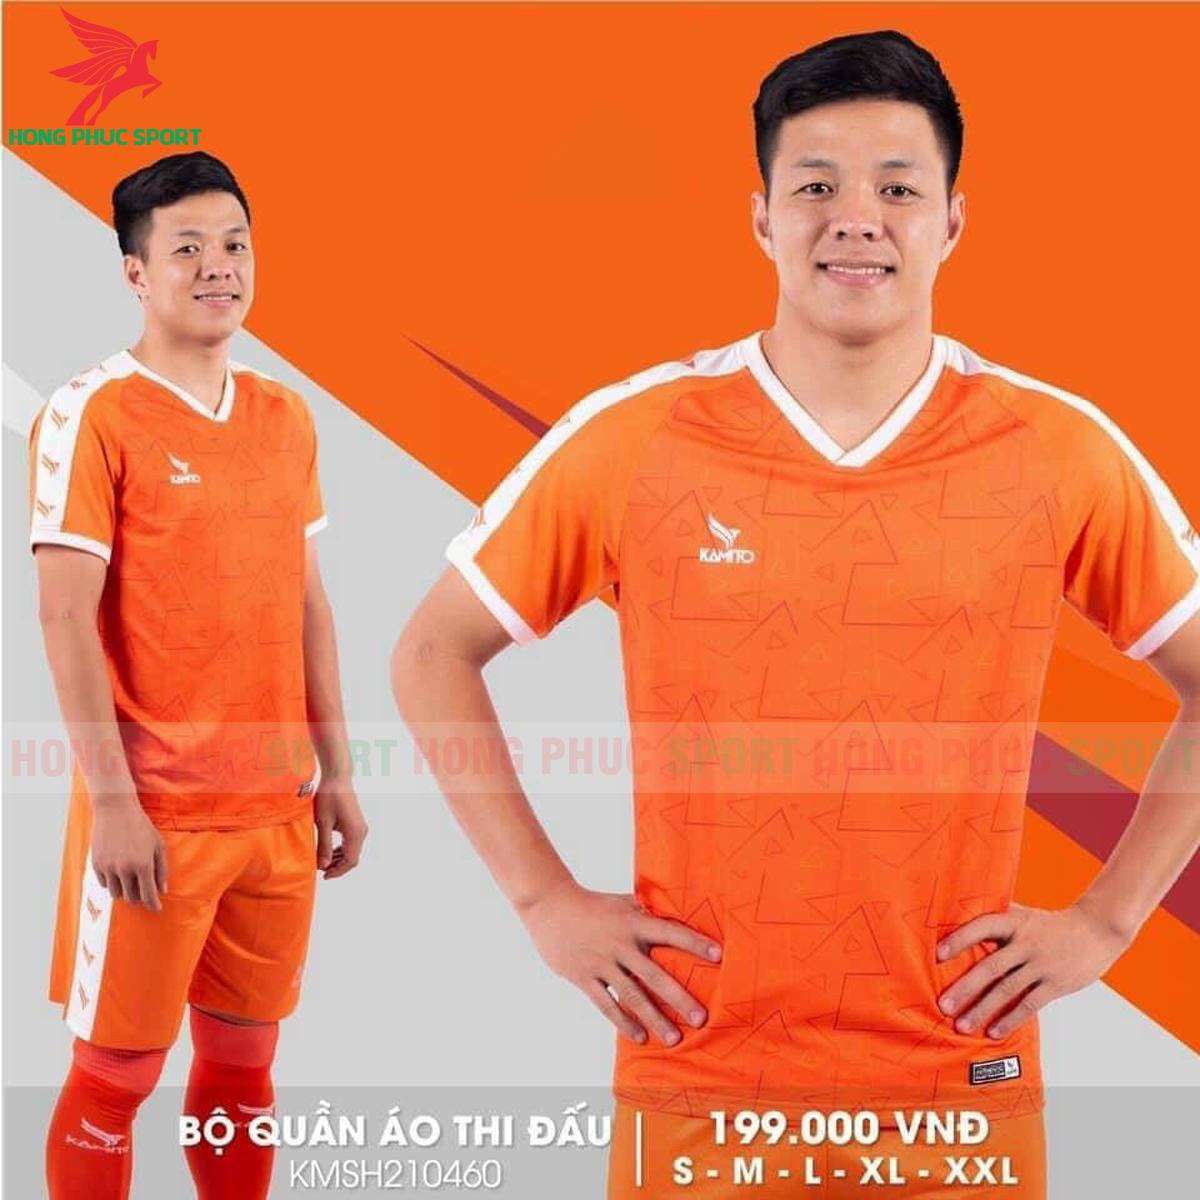 https://cdn.hongphucsport.com/unsafe/s4.shopbay.vn/files/285/ao-khong-logo-kamito-kmsh210460-6076a792e08a8.png